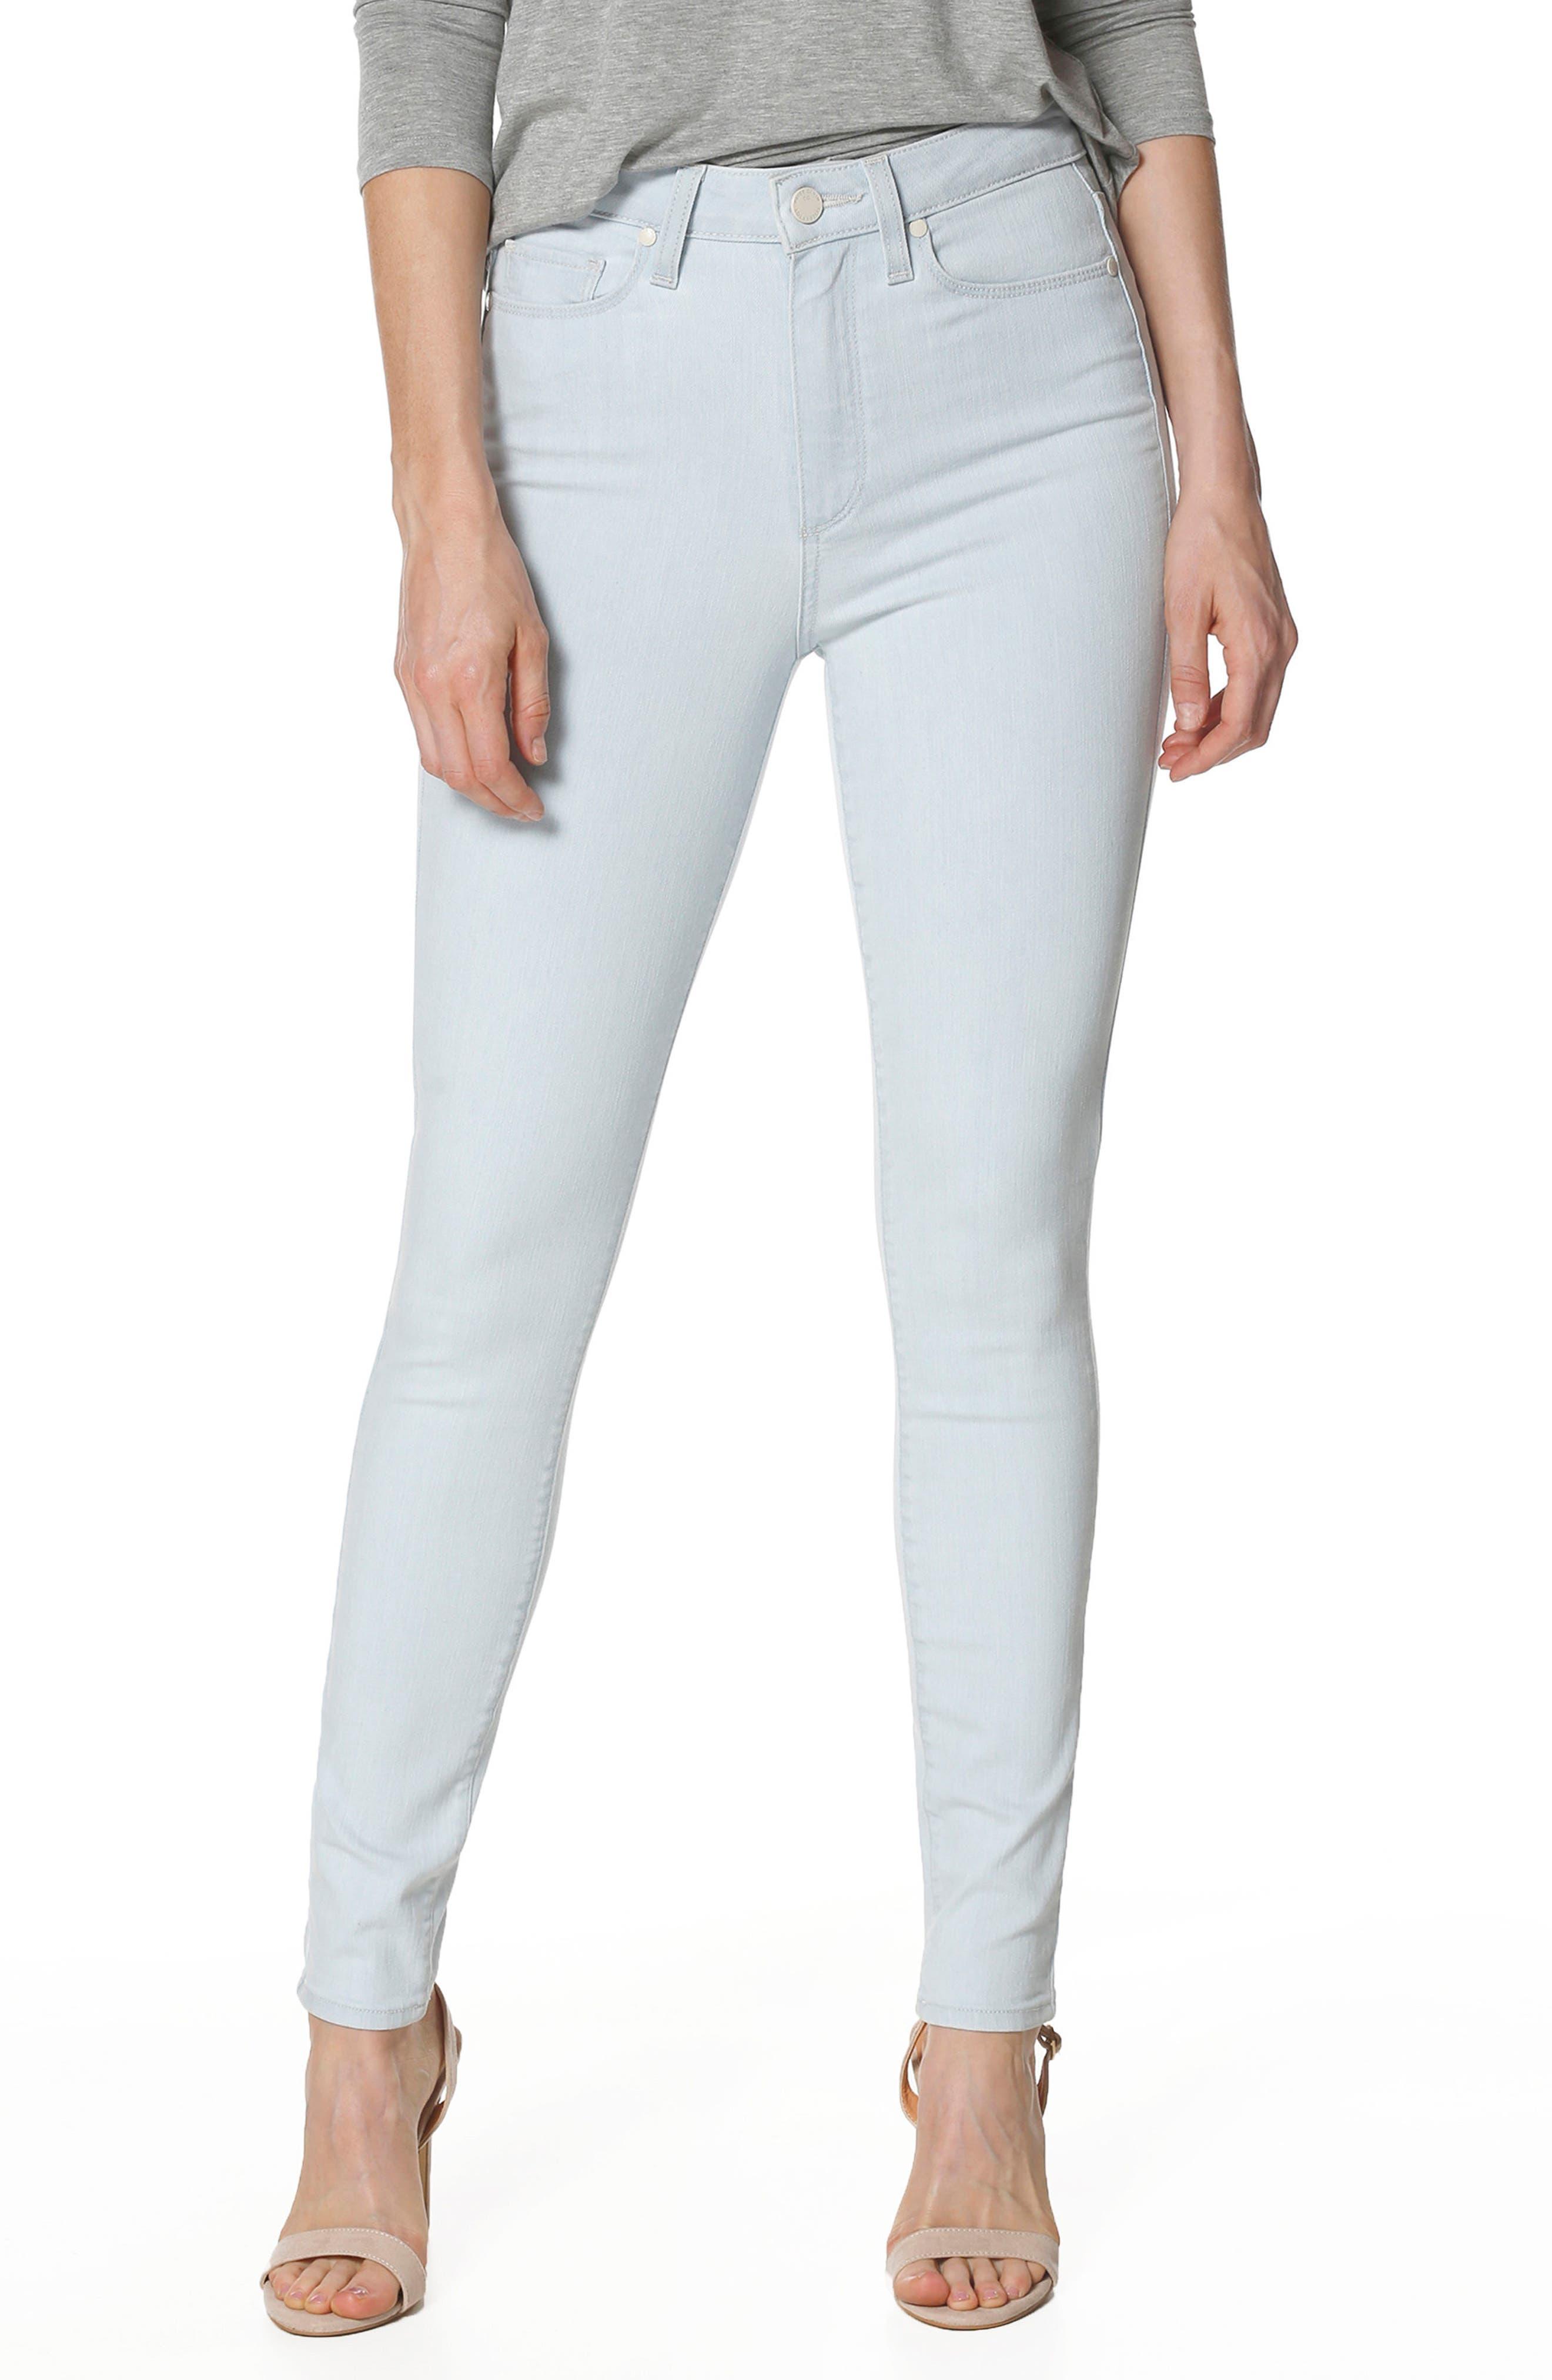 Margot High Waist Ultra Skinny Jeans,                             Main thumbnail 1, color,